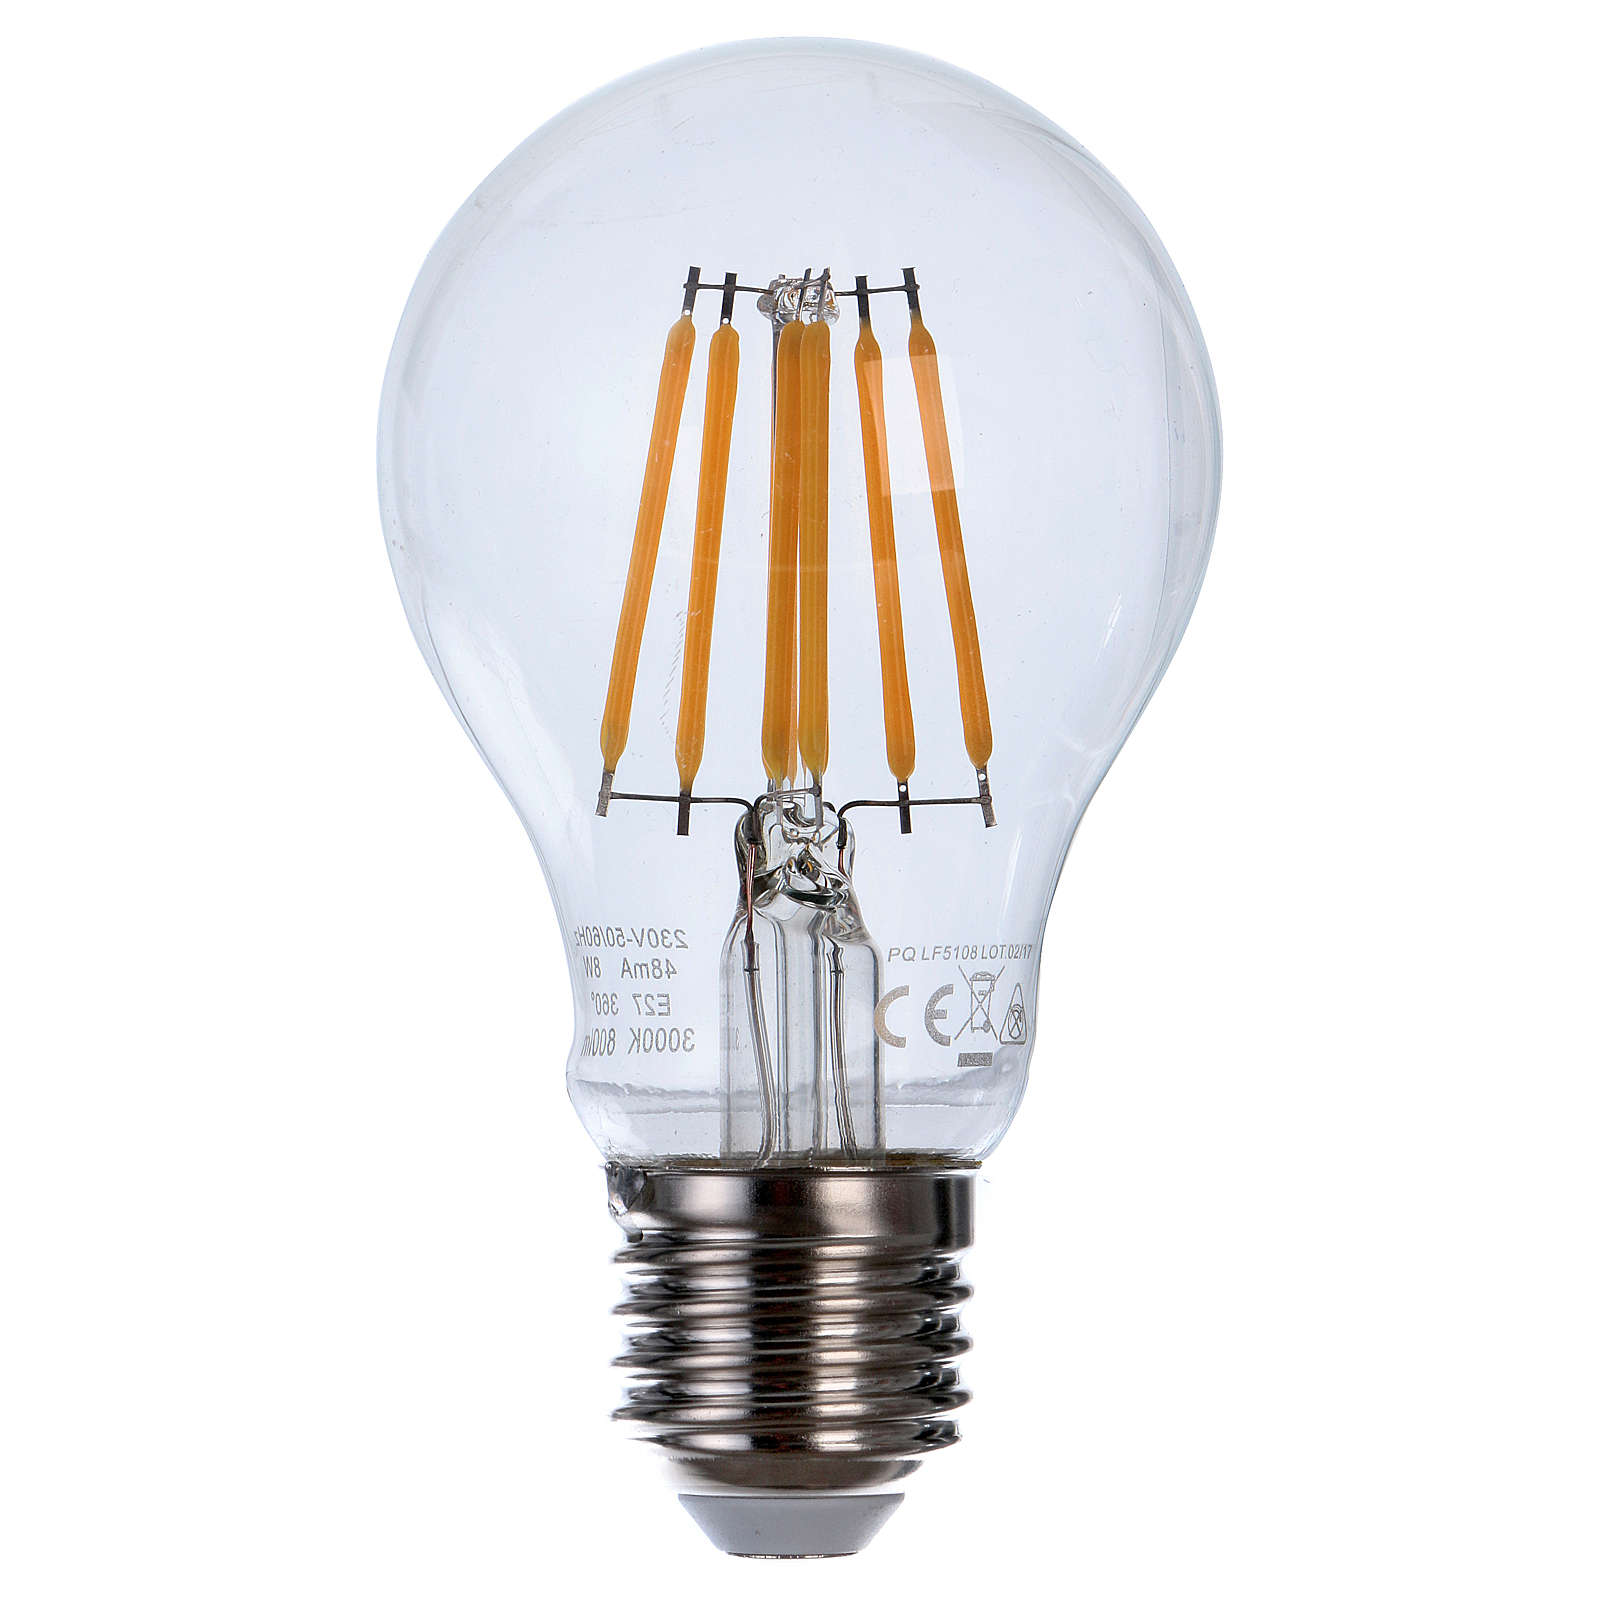 LED Filament E27 Bulb 8W 3